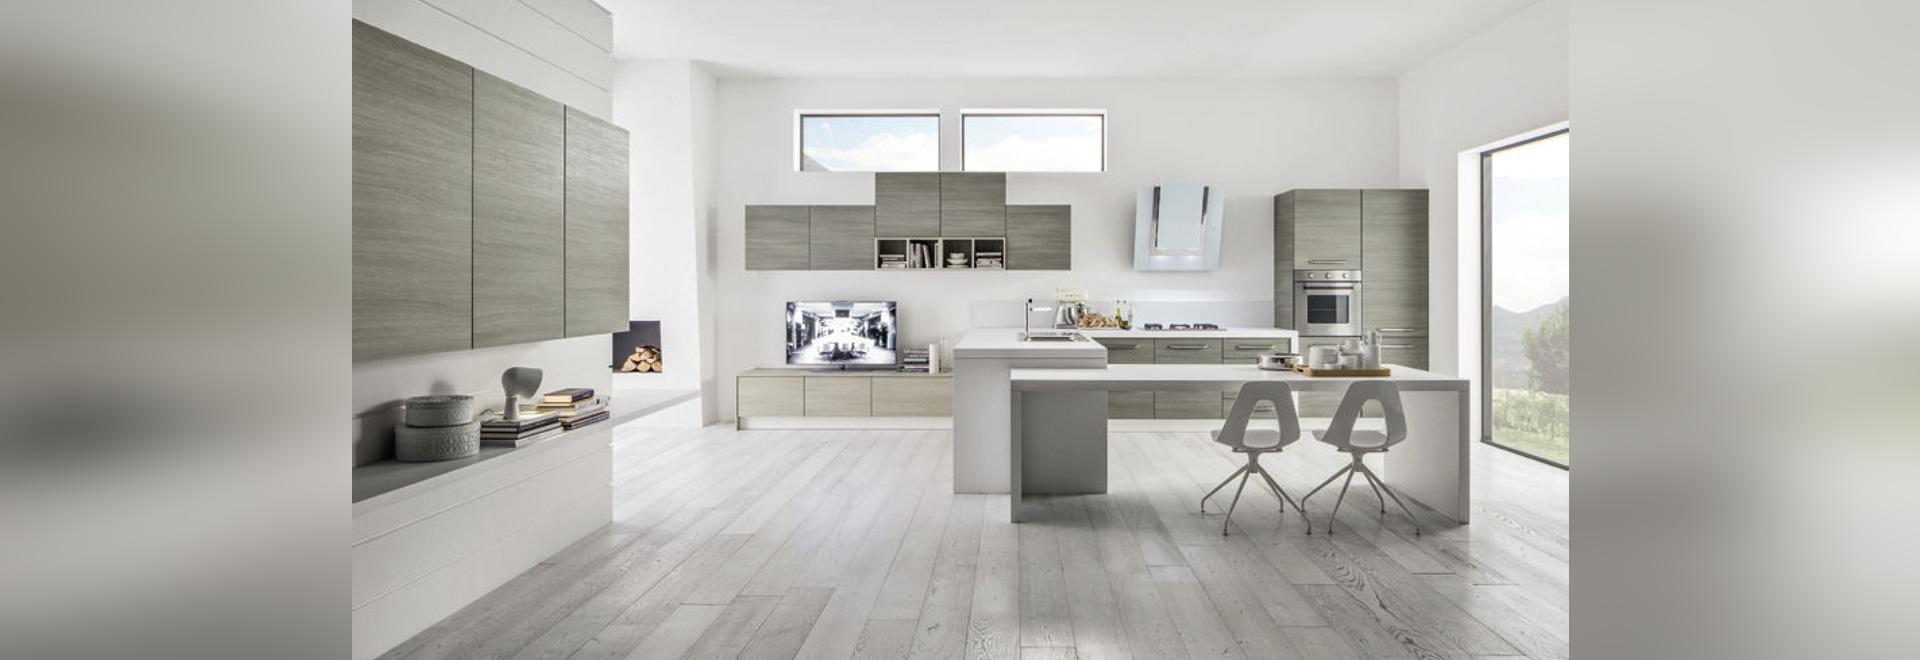 NOVITÀ CACAO cucina moderna by Arrex - Arrex